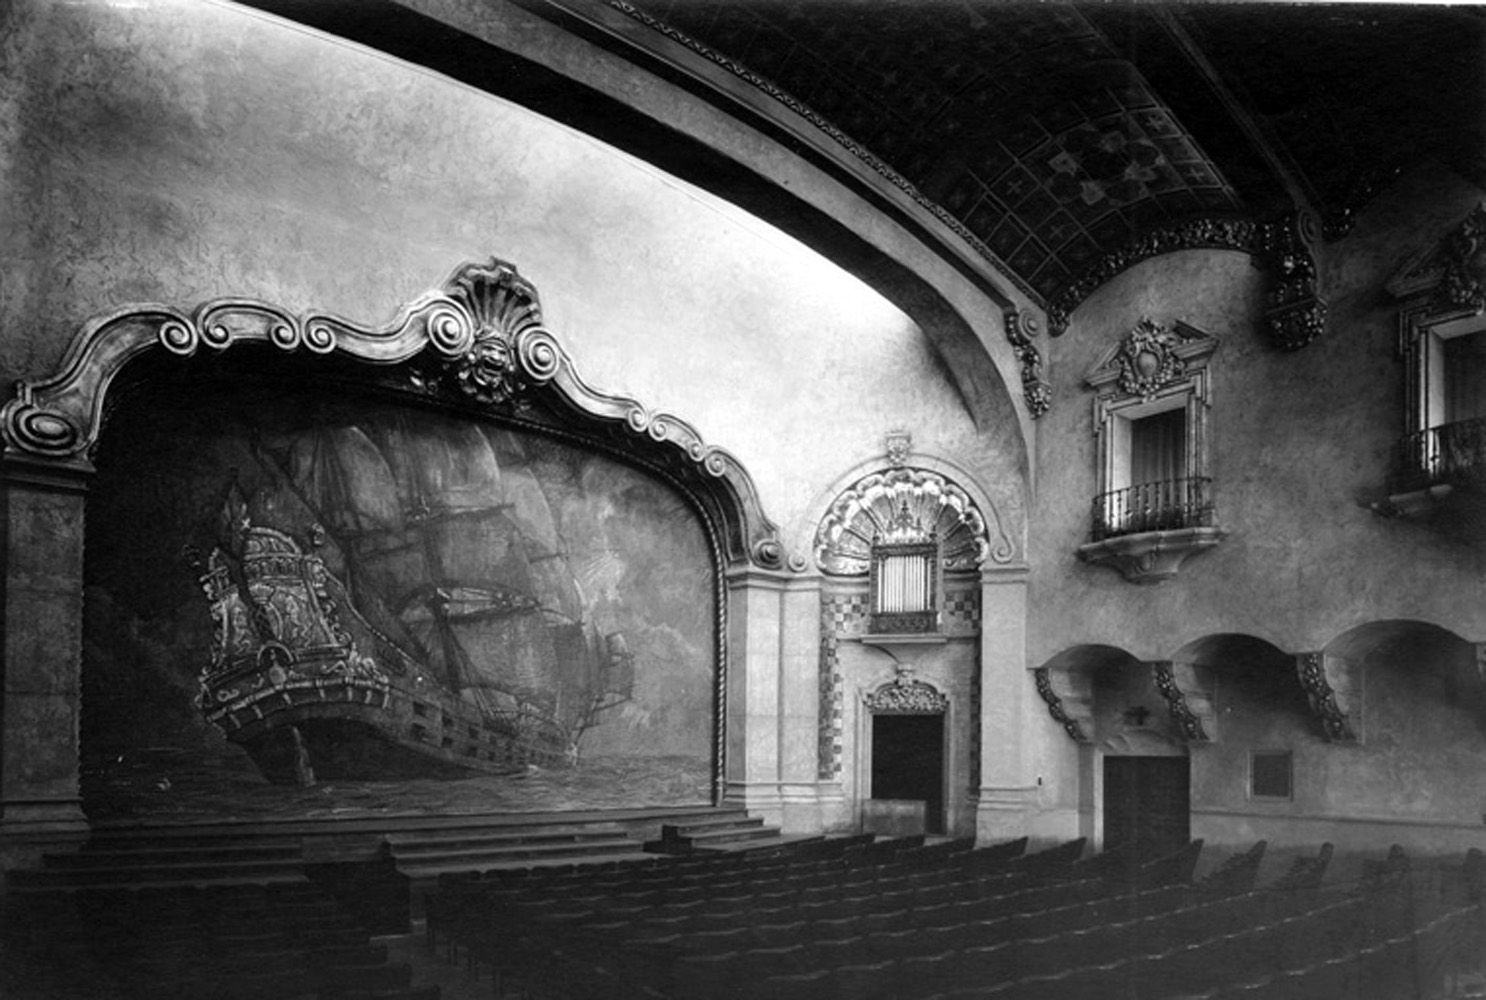 The Auditorium Of The Pasadena Playhouse 39 S El Molino Ave Pasadena Ca 91101 In 1930 Back